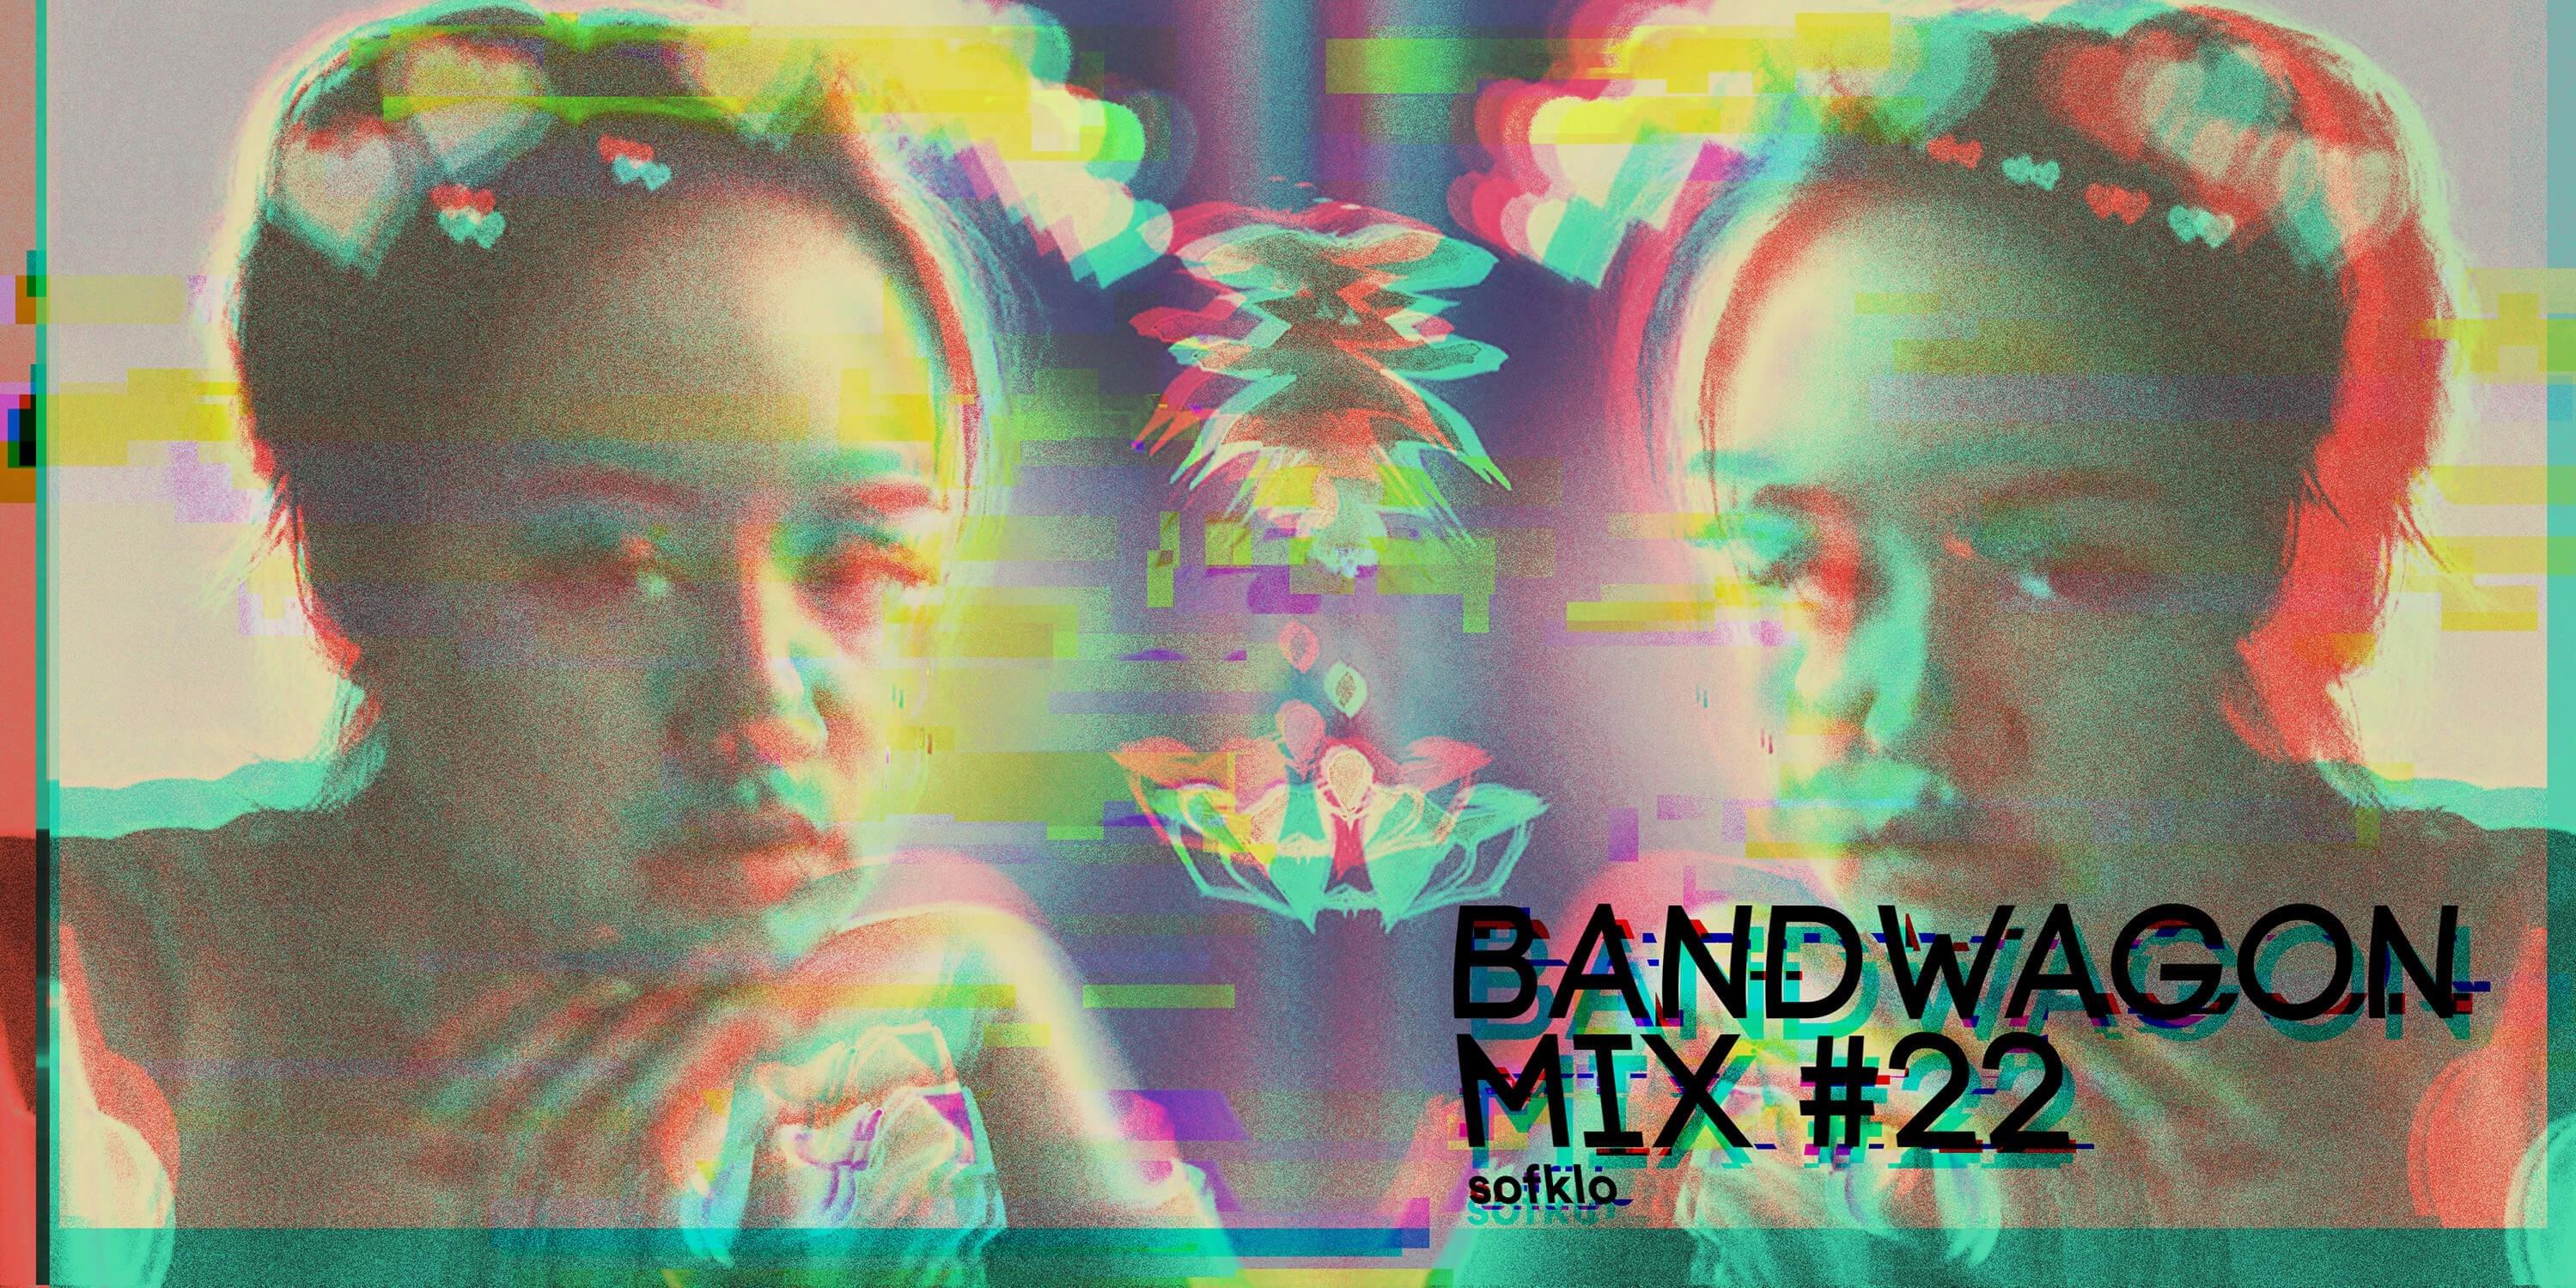 Bandwagon Mix #22: sofklo